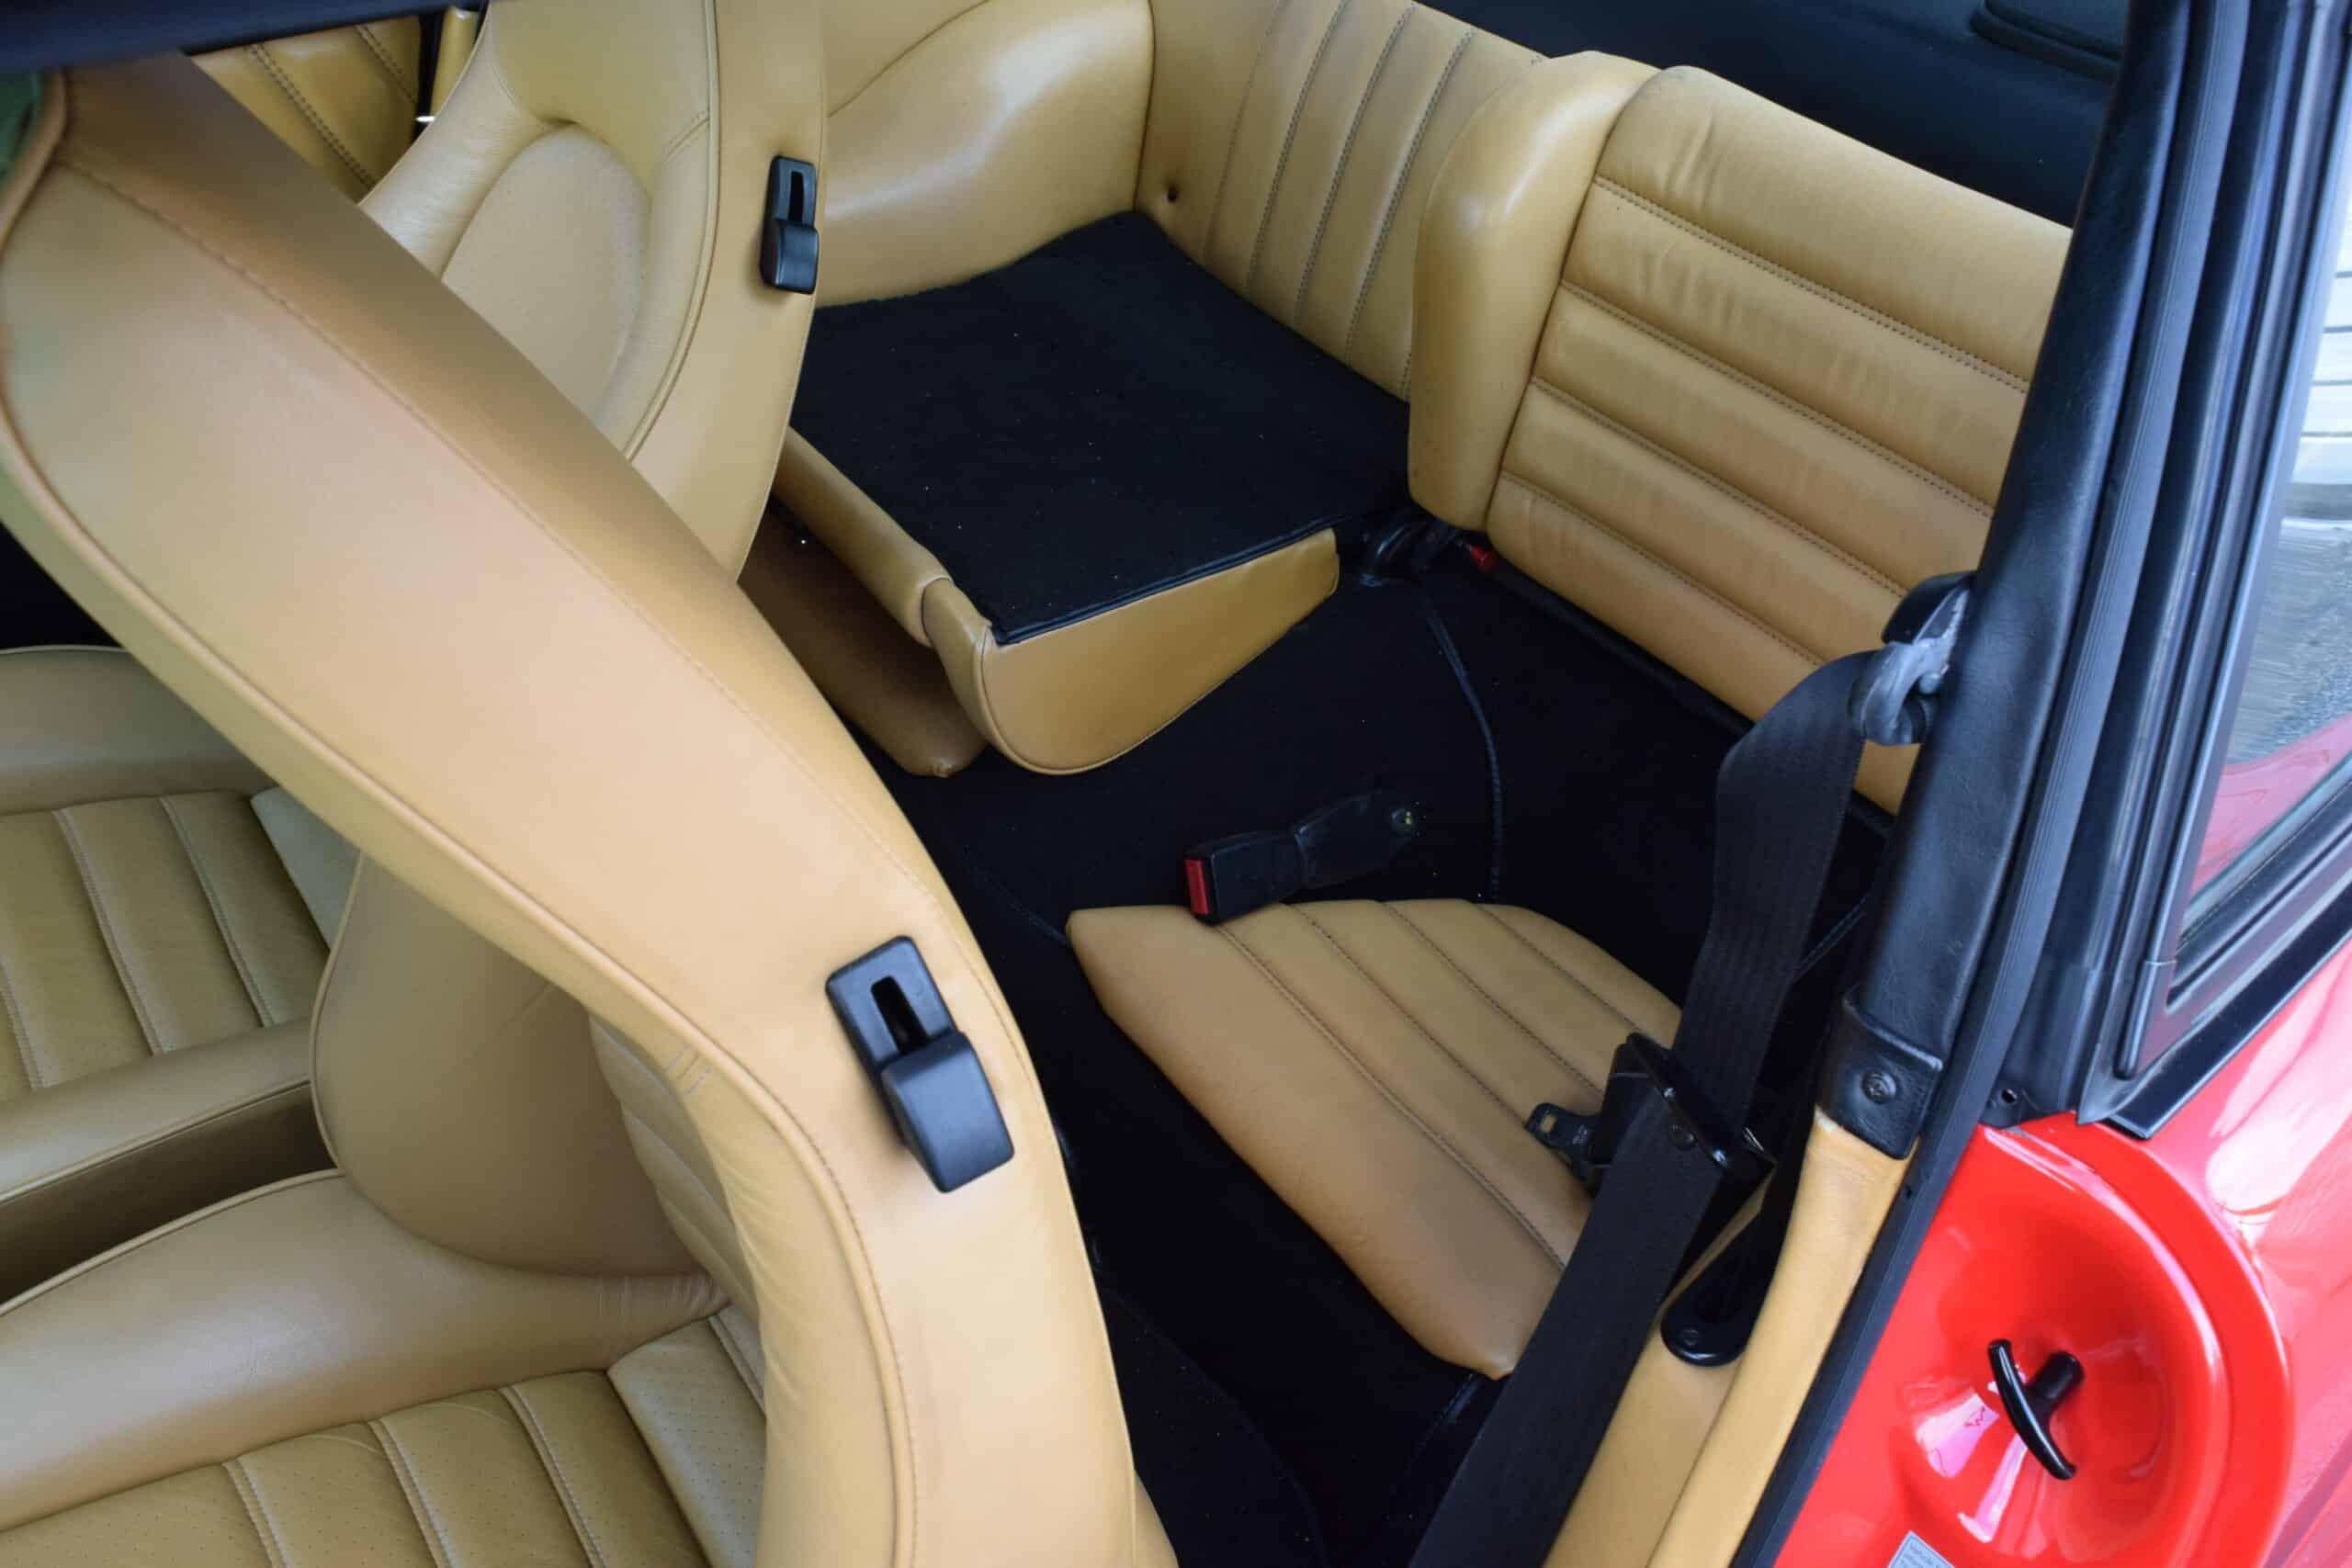 1986 Turbo 930, beautiful sports seats interior, BBS wheels, amazing condition